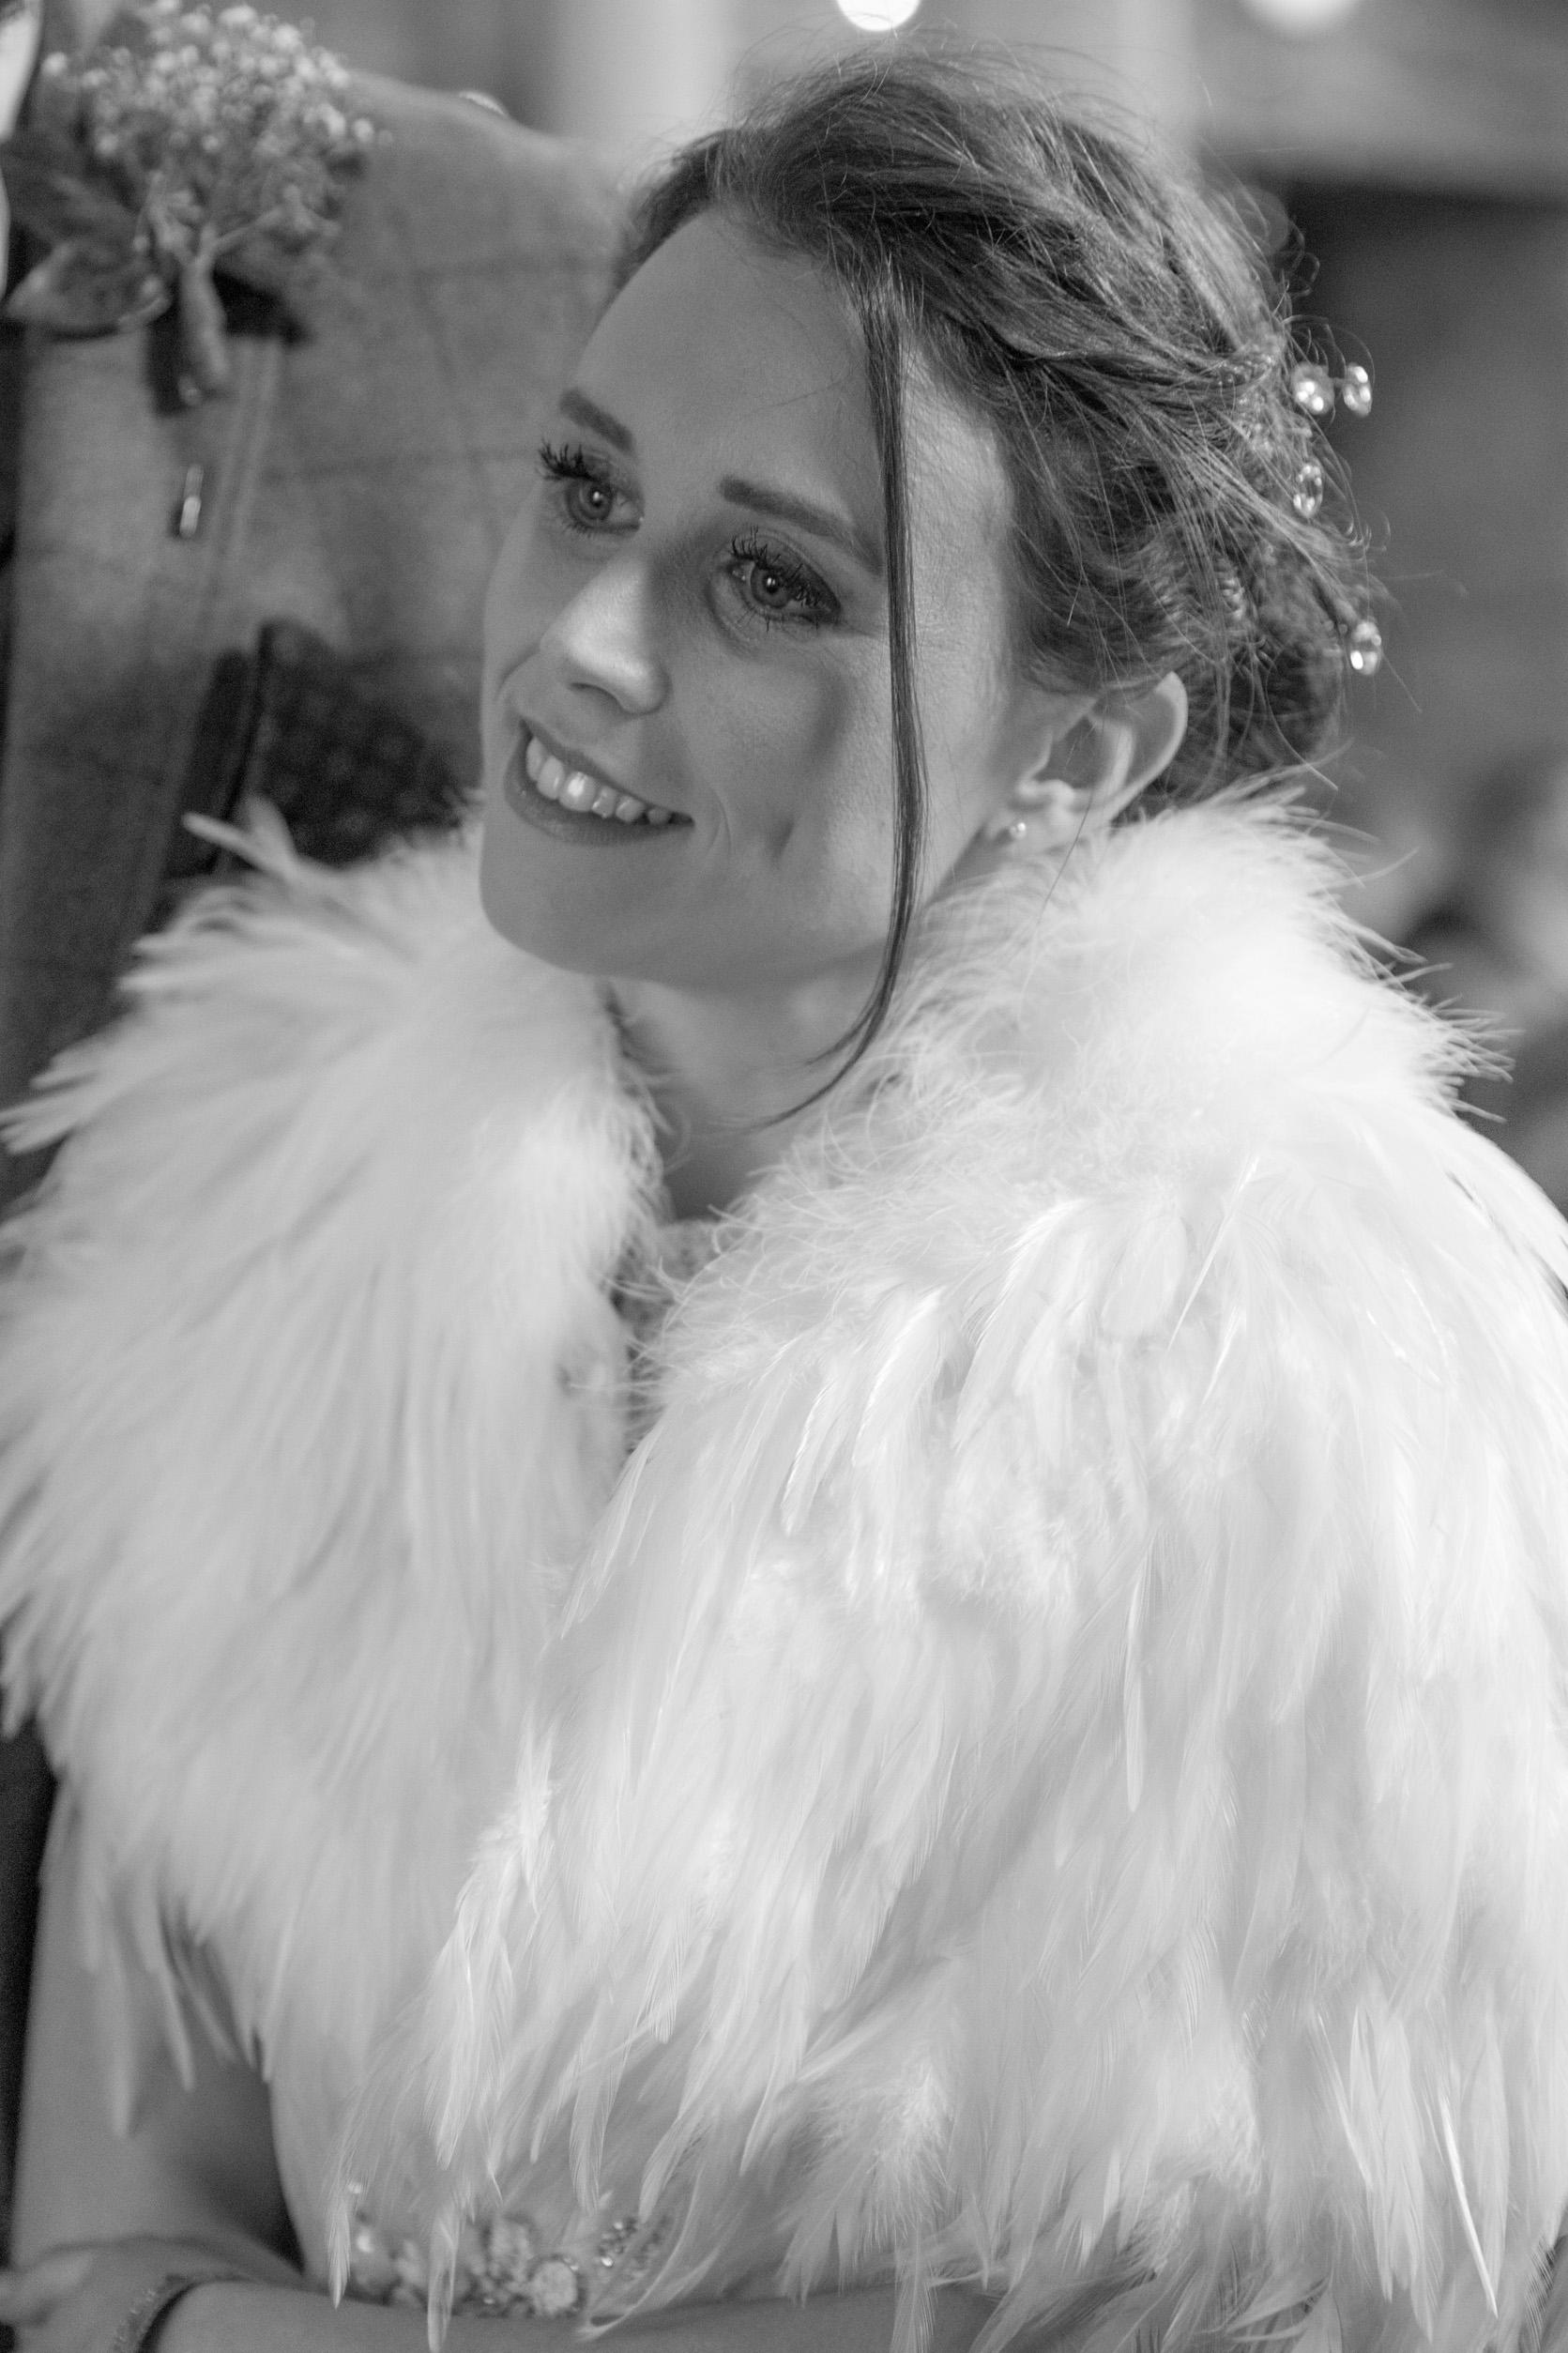 Jess & Ben - Bristol Wedding Photographer - Wright Wedding Photography - 70